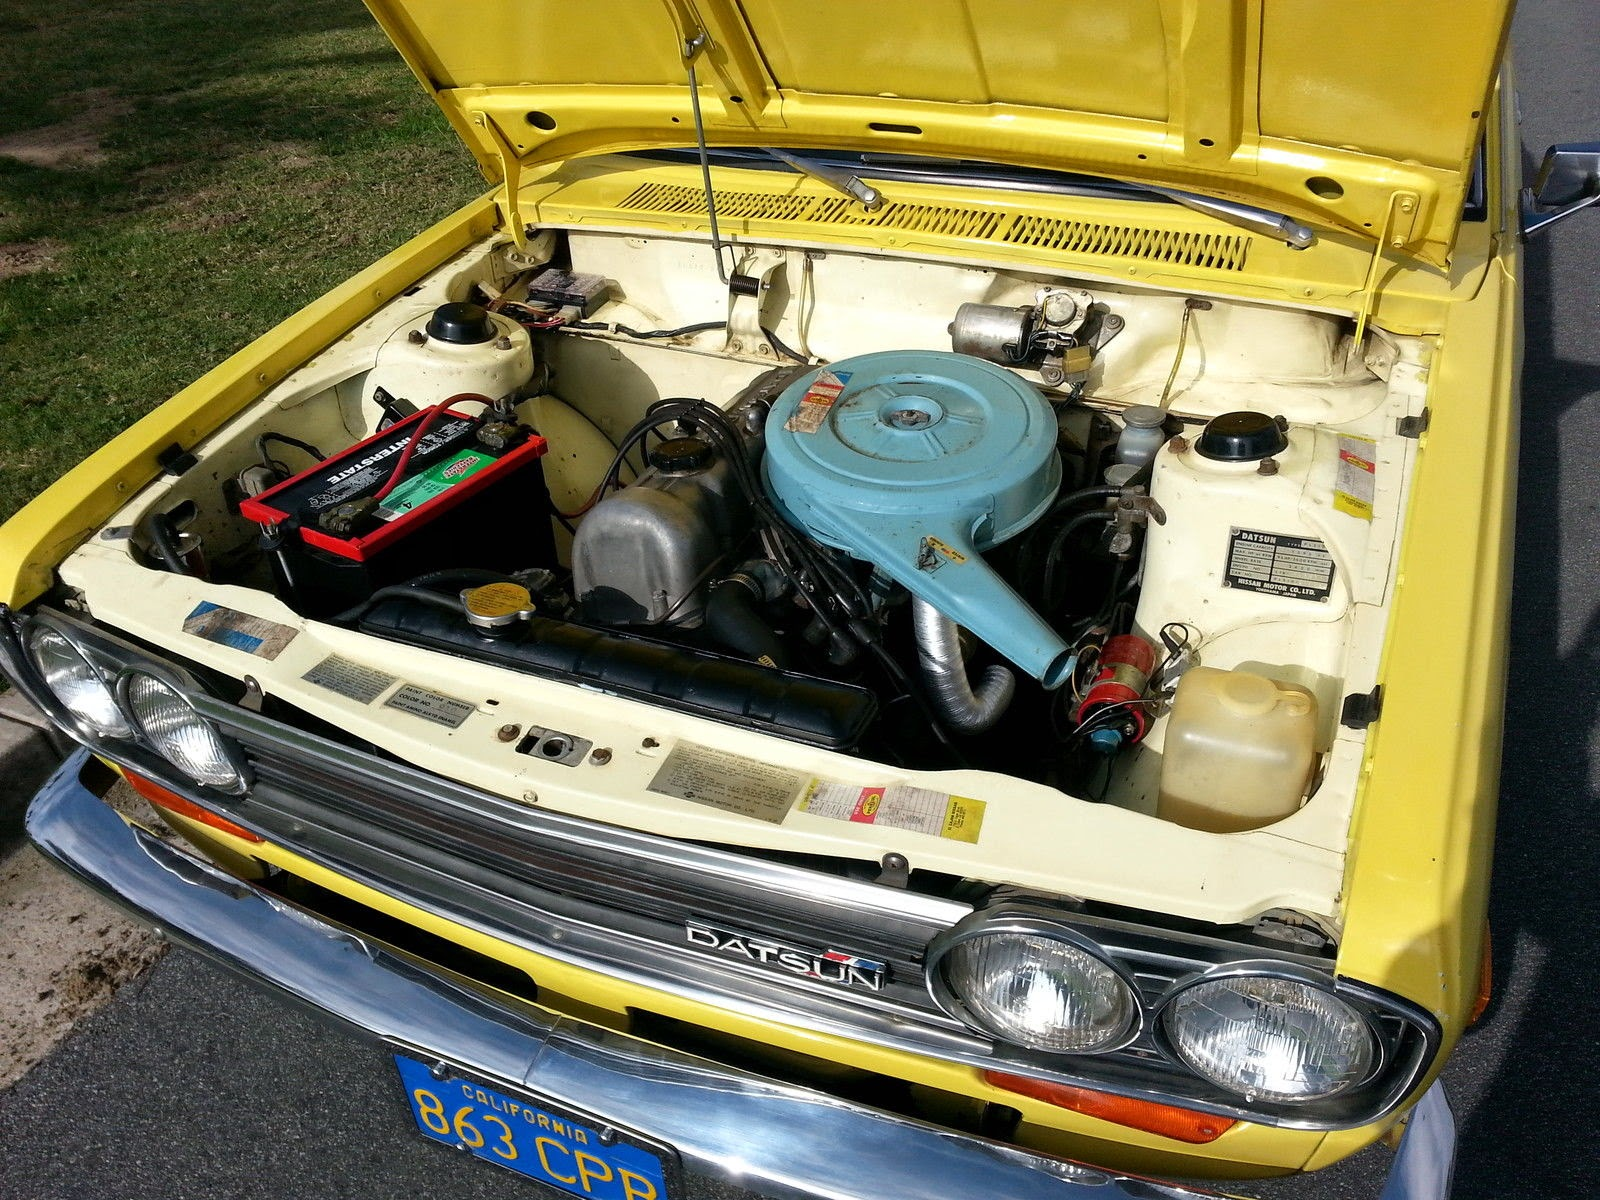 Daily Turismo 15k Yellow Fever 1971 Datsun 510 Bluebird